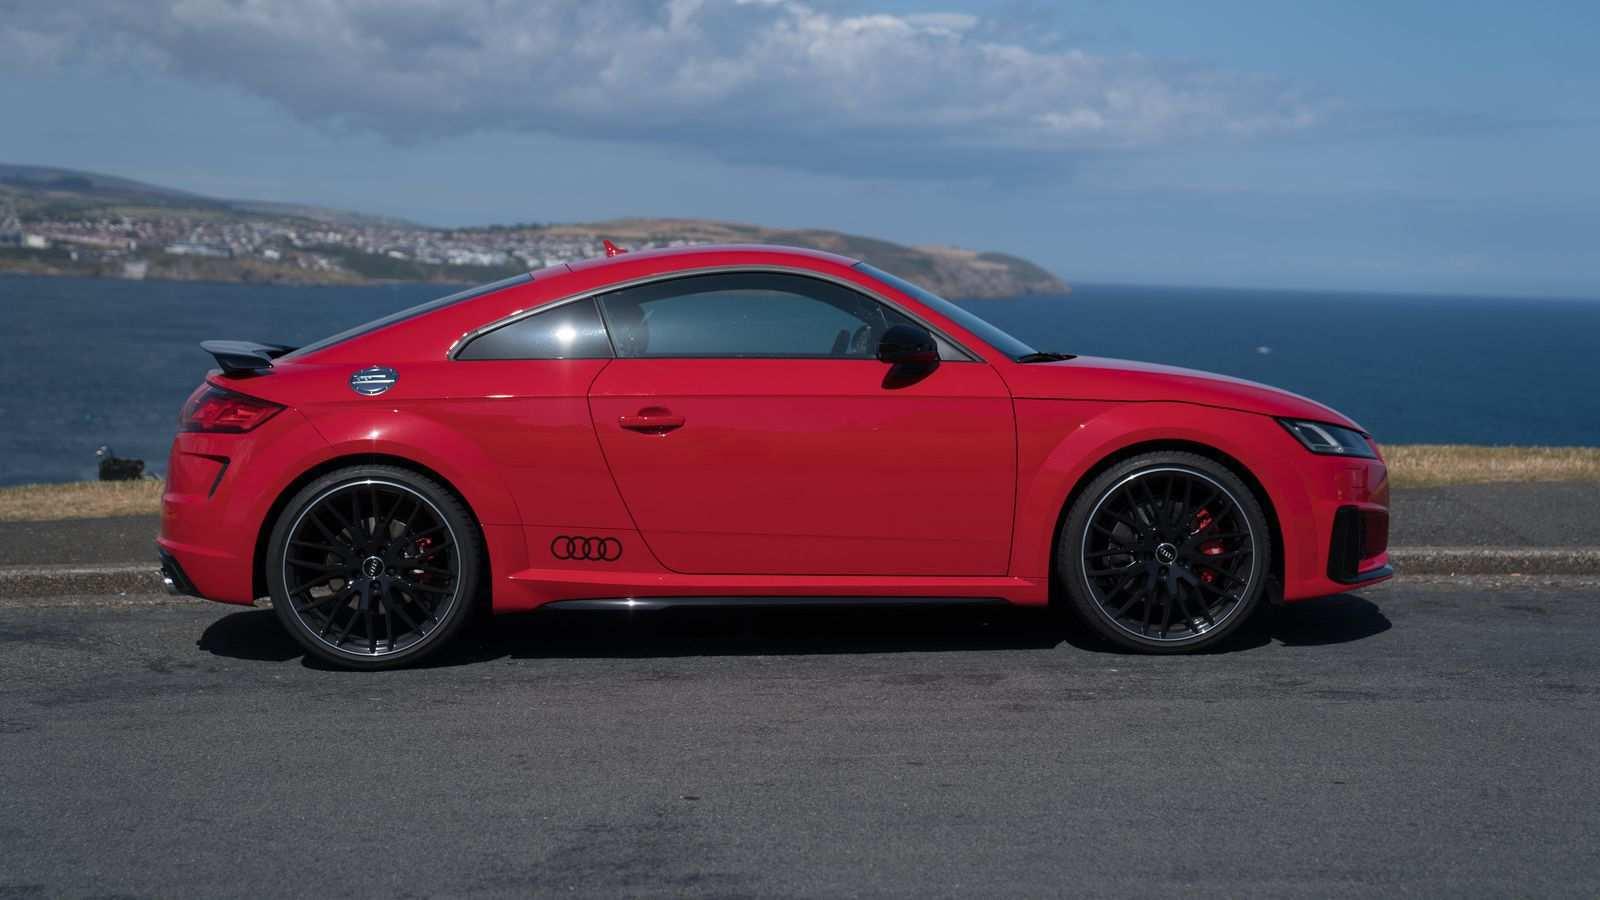 56 Concept of 2019 Audi Tt Photos with 2019 Audi Tt